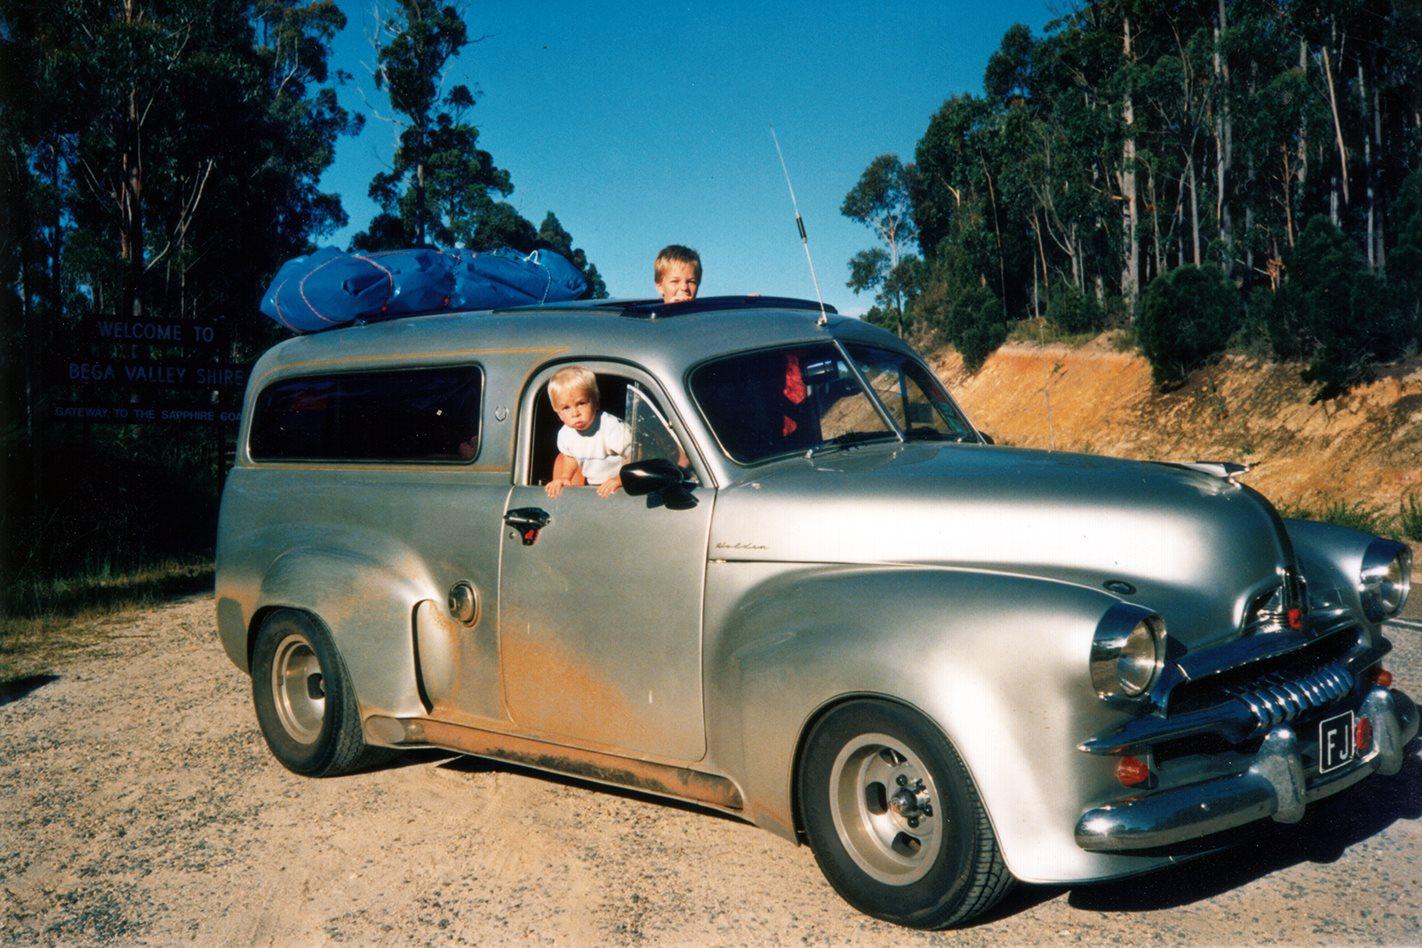 2015 Toyota Camry For Sale >> THE VAN THAT TIME FORGOT: NEIL DIECKMANN'S WILD FJ HOLDEN